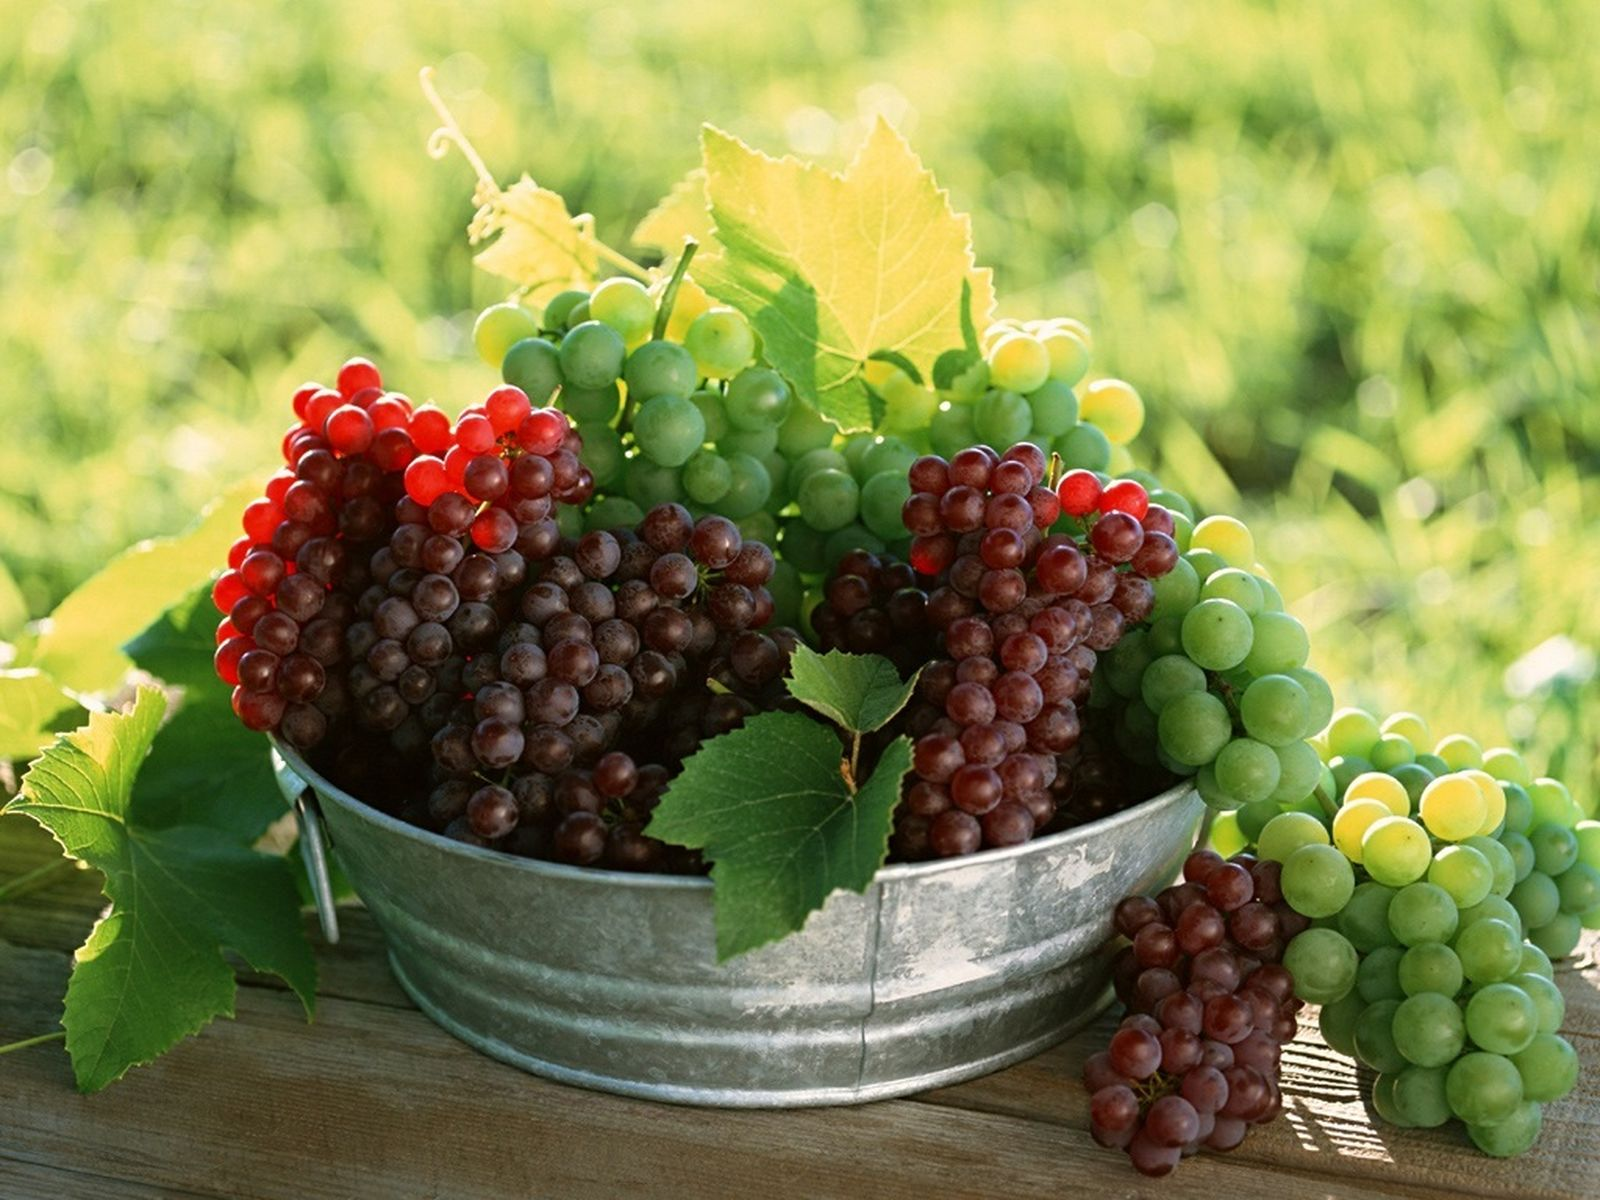 Hd fruits wallpapers 1600x1200 - Fresh Fruit Grapes Hd Pictures Cherry Widescreen Desktop Free Wallpaper